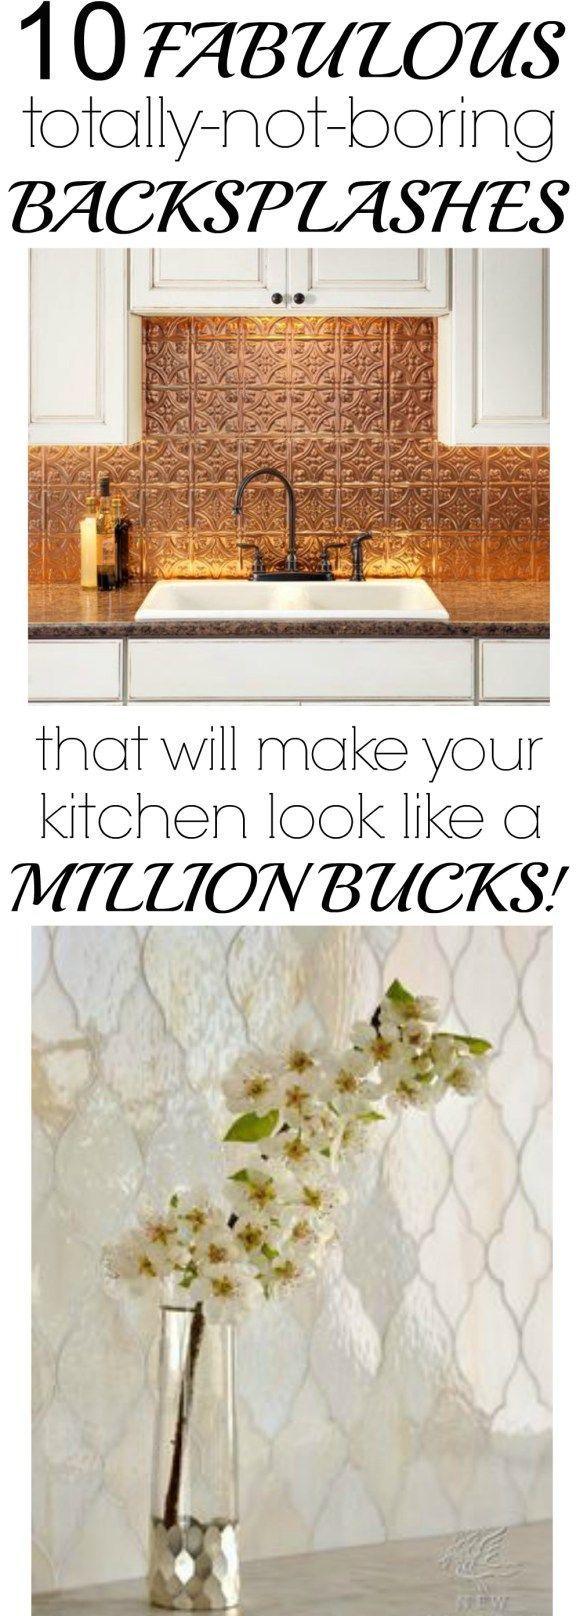 64 best kitchen backsplash images on pinterest backsplash ideas